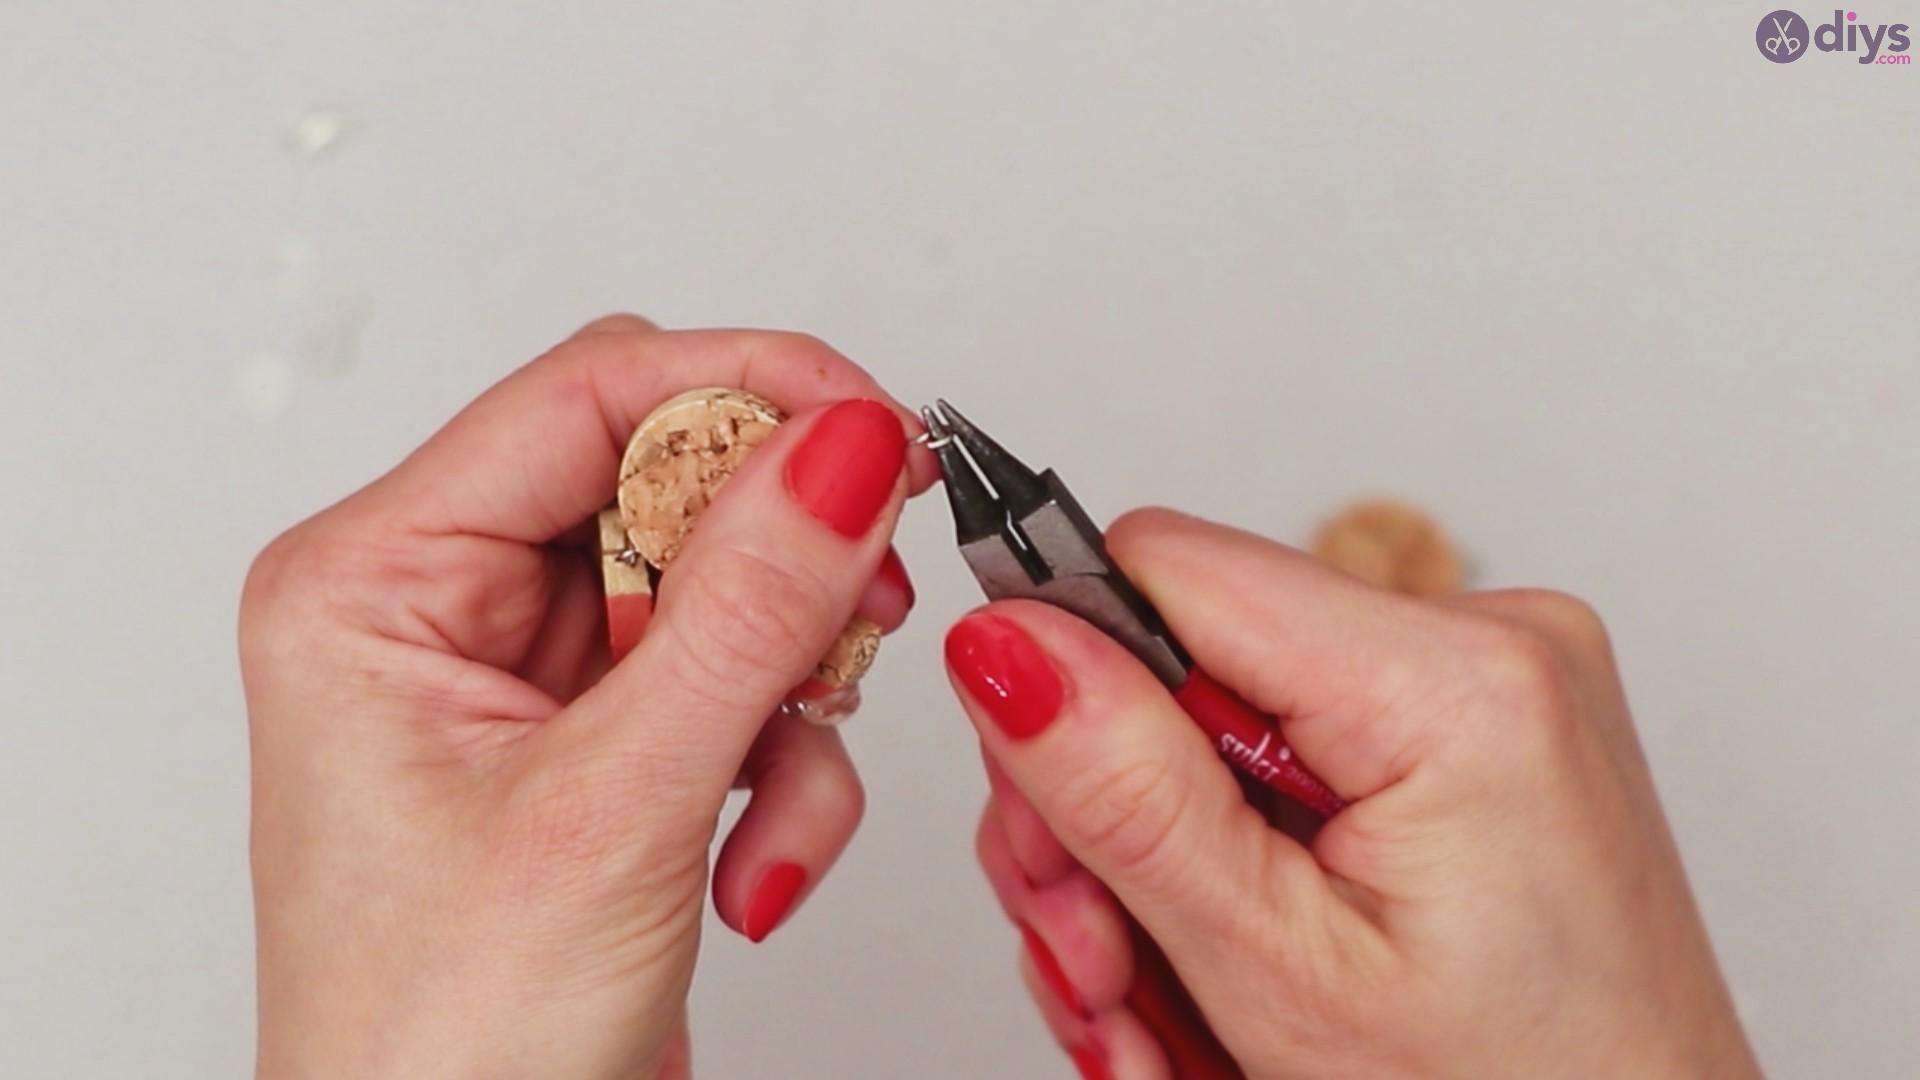 Diy wine cork necklace (38)